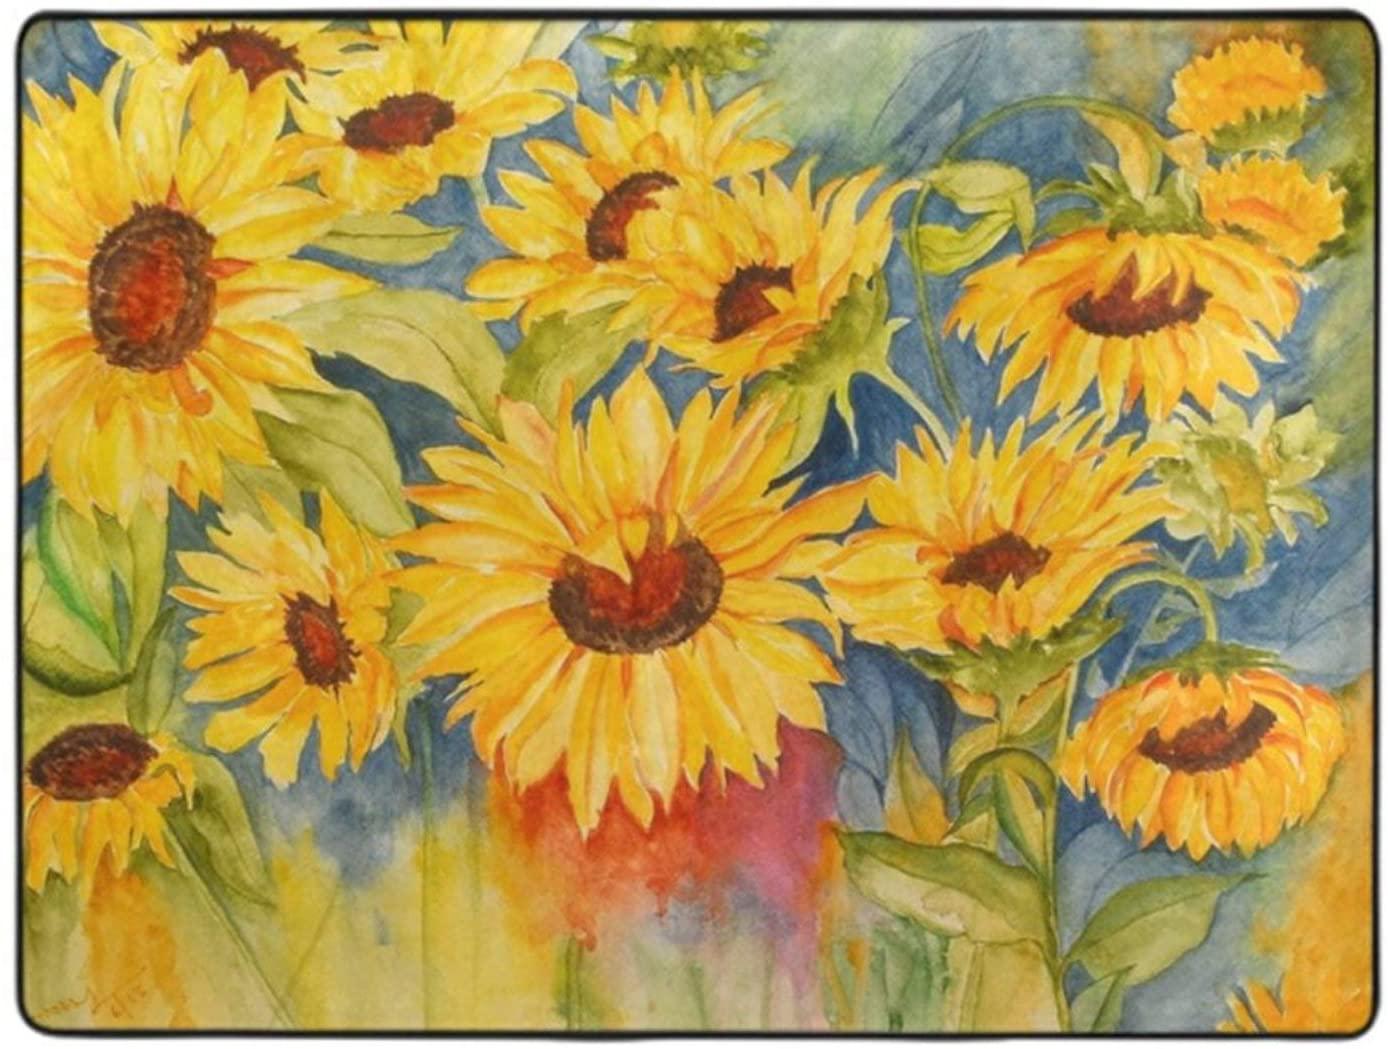 Floor Carpet Beautiful Sunrise Sunflower Natural Art Rug Premium 60x48 Floor Decoration for Home Bedroom Living Dining Room